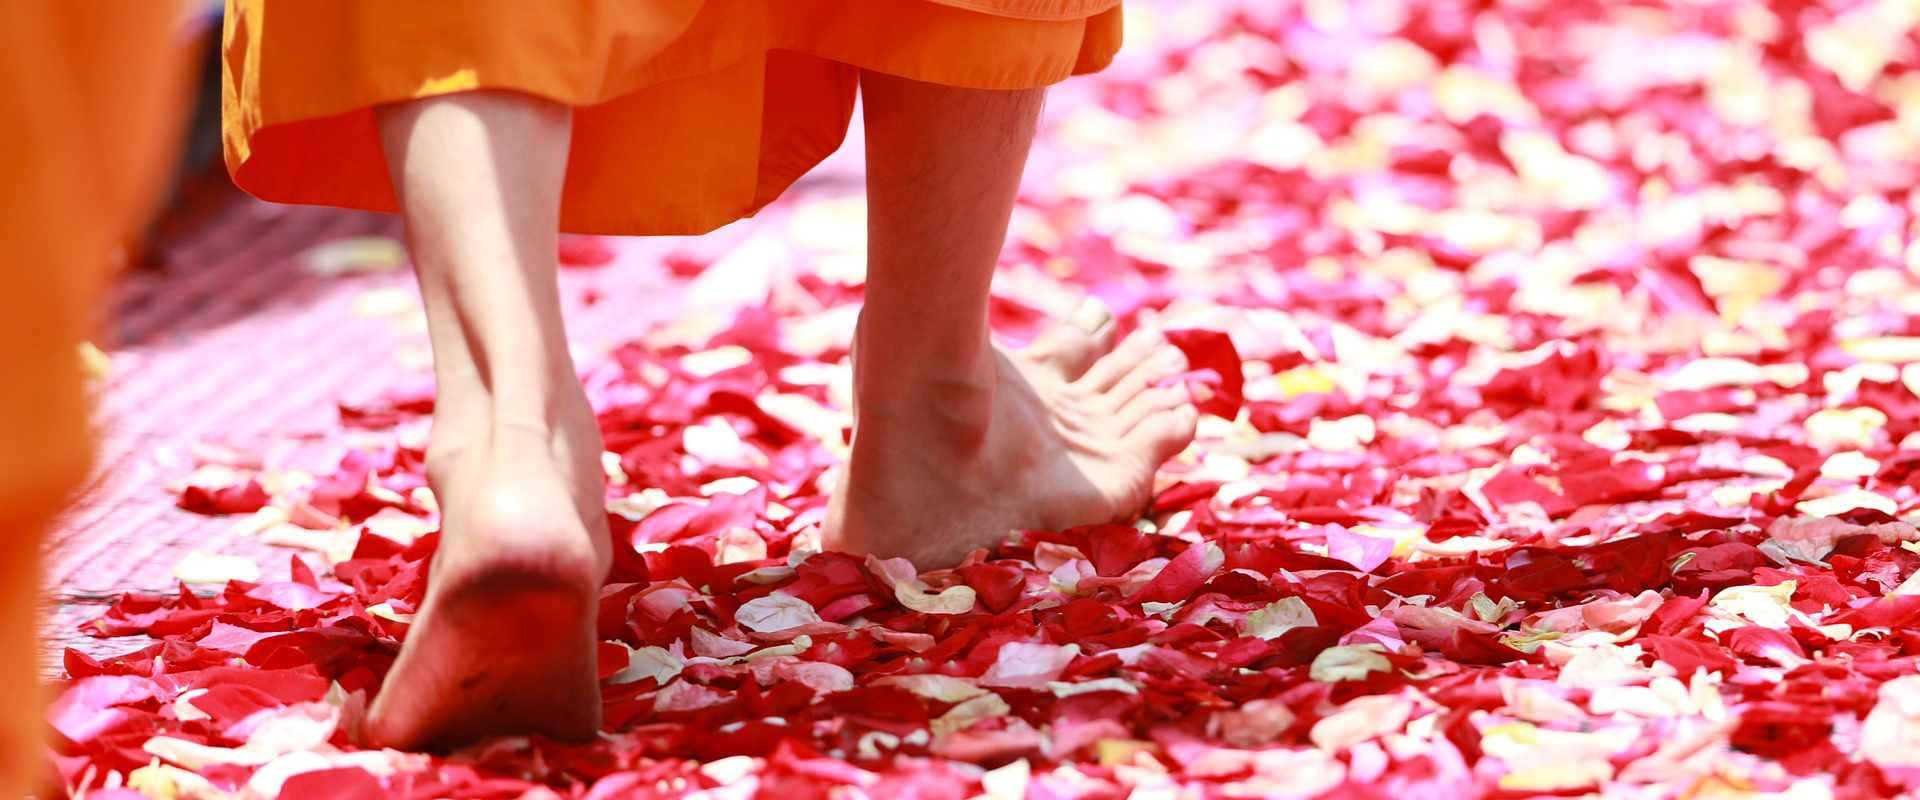 Thaïlande | Moine bouddhiste